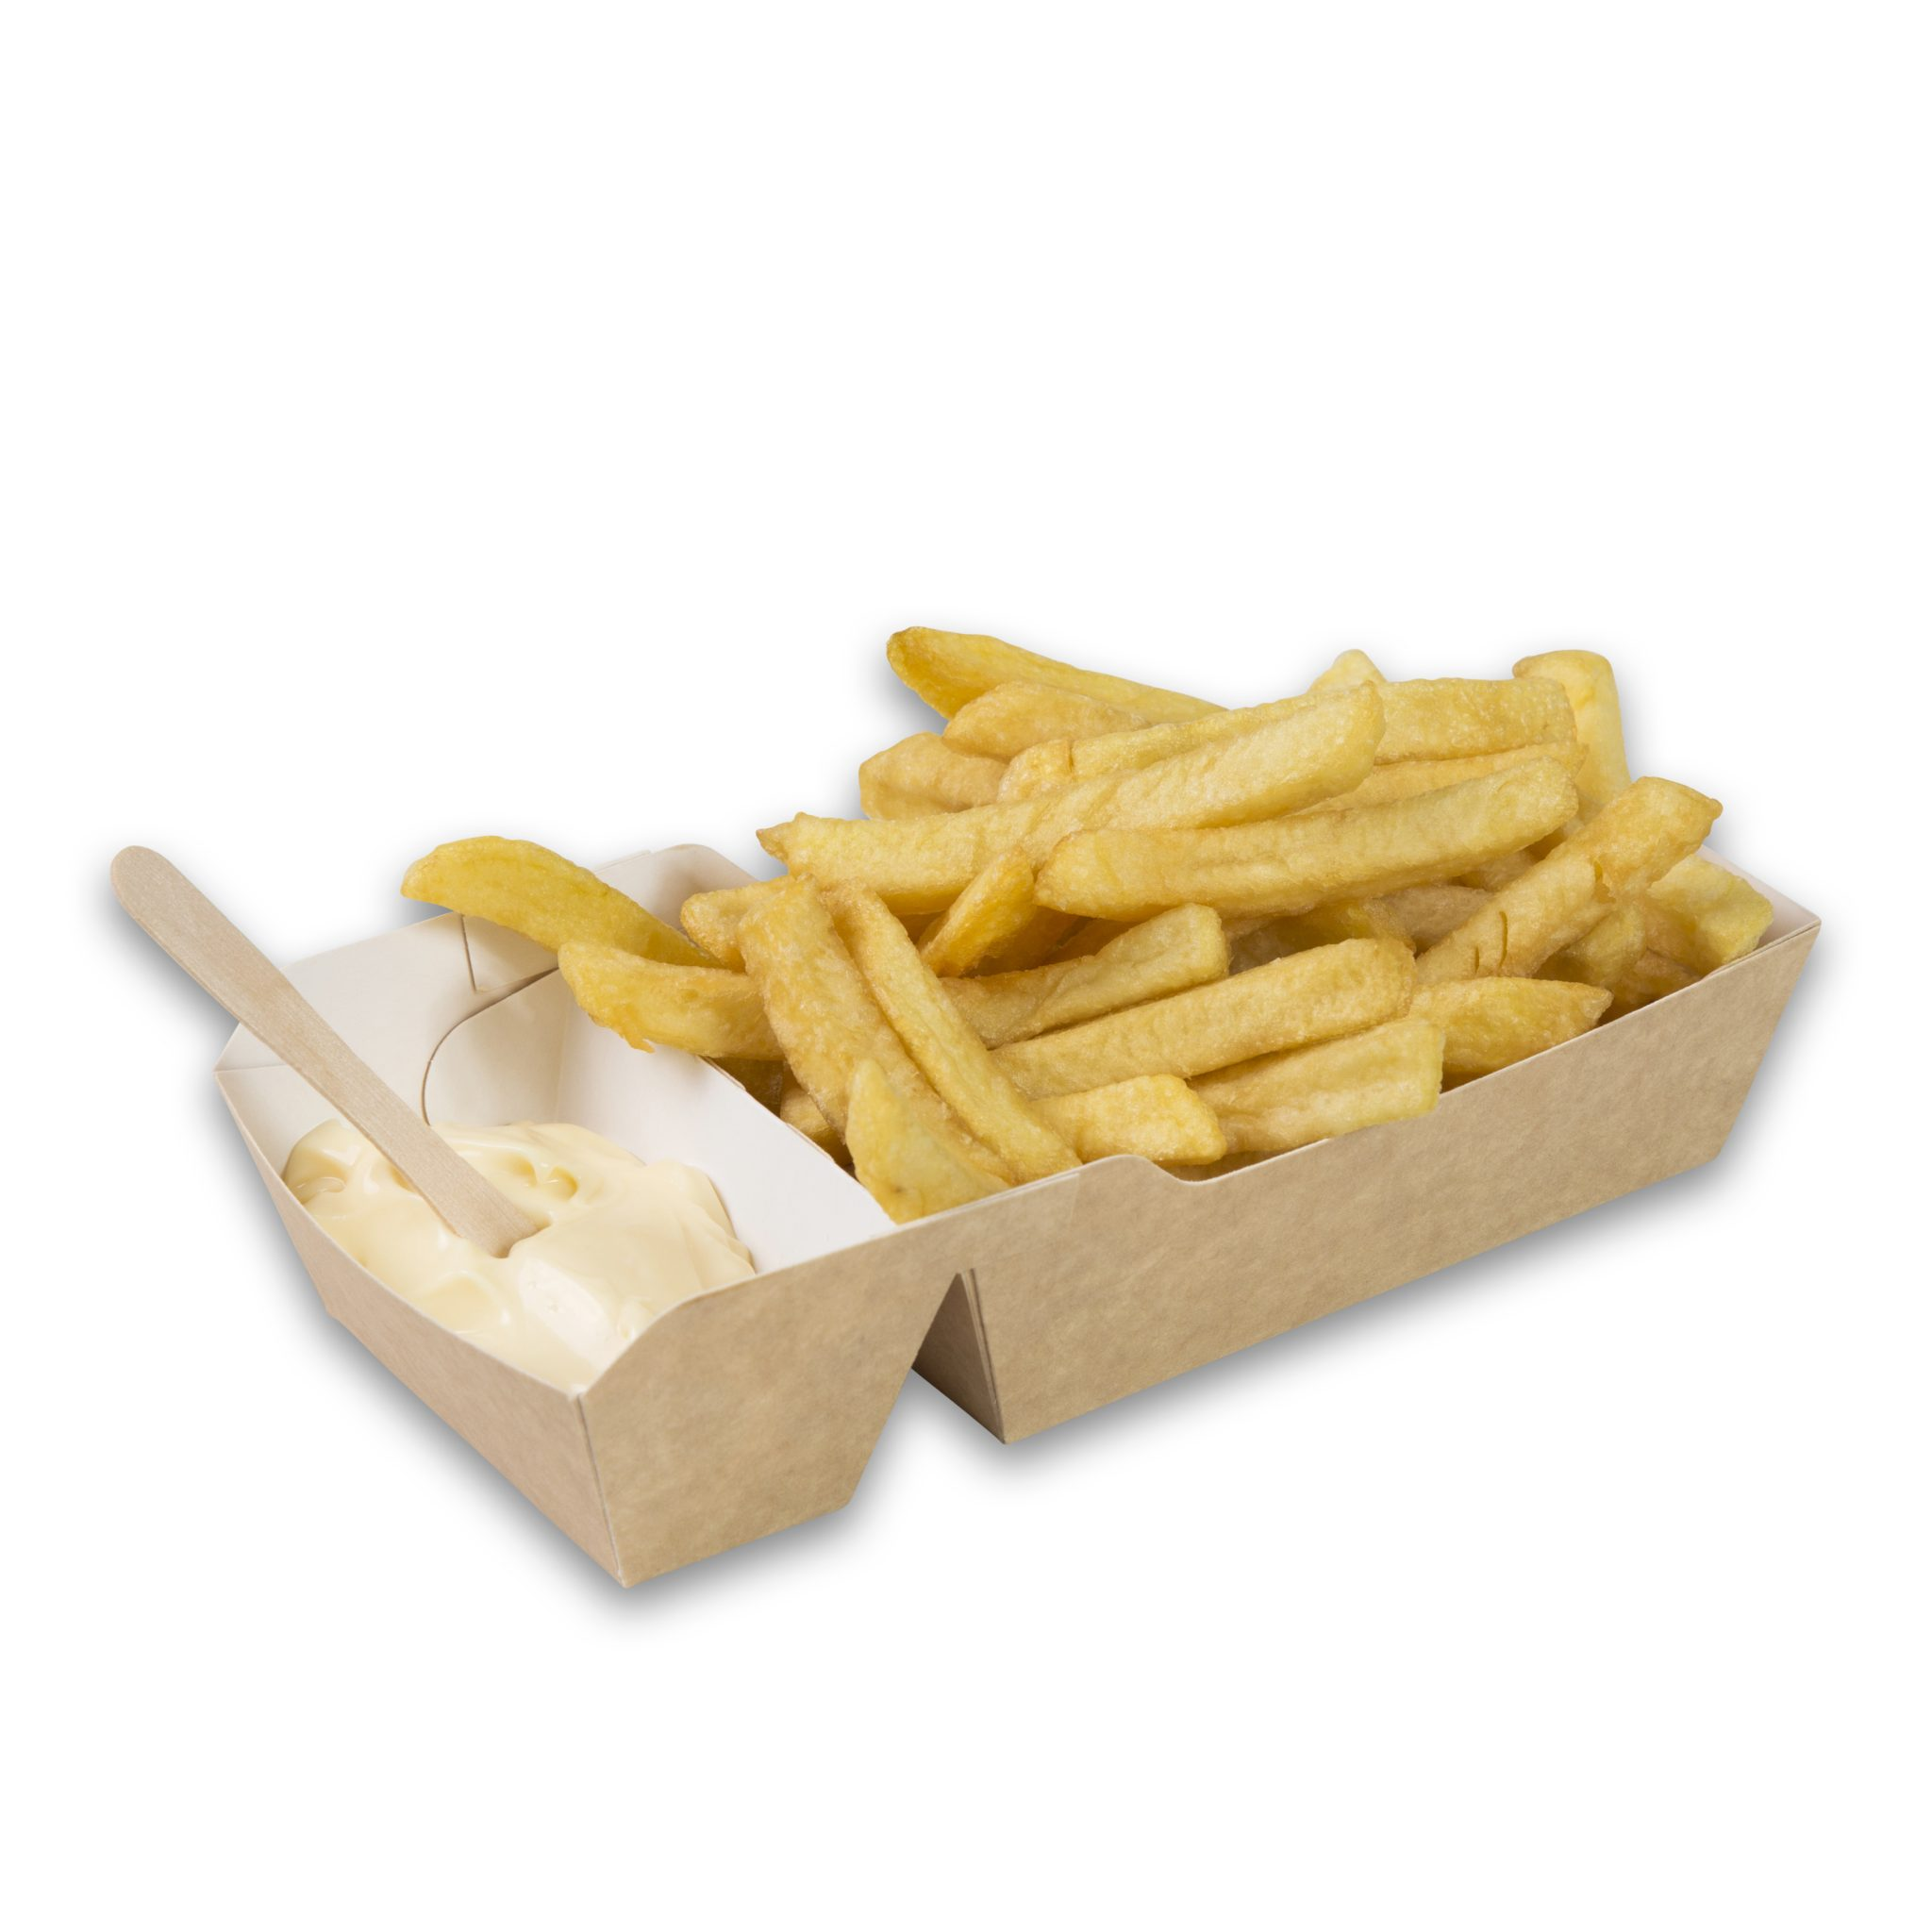 Kraft Karton Frietbakjes met sausvakje M A9+1 110x70x35 snackverpakking medium